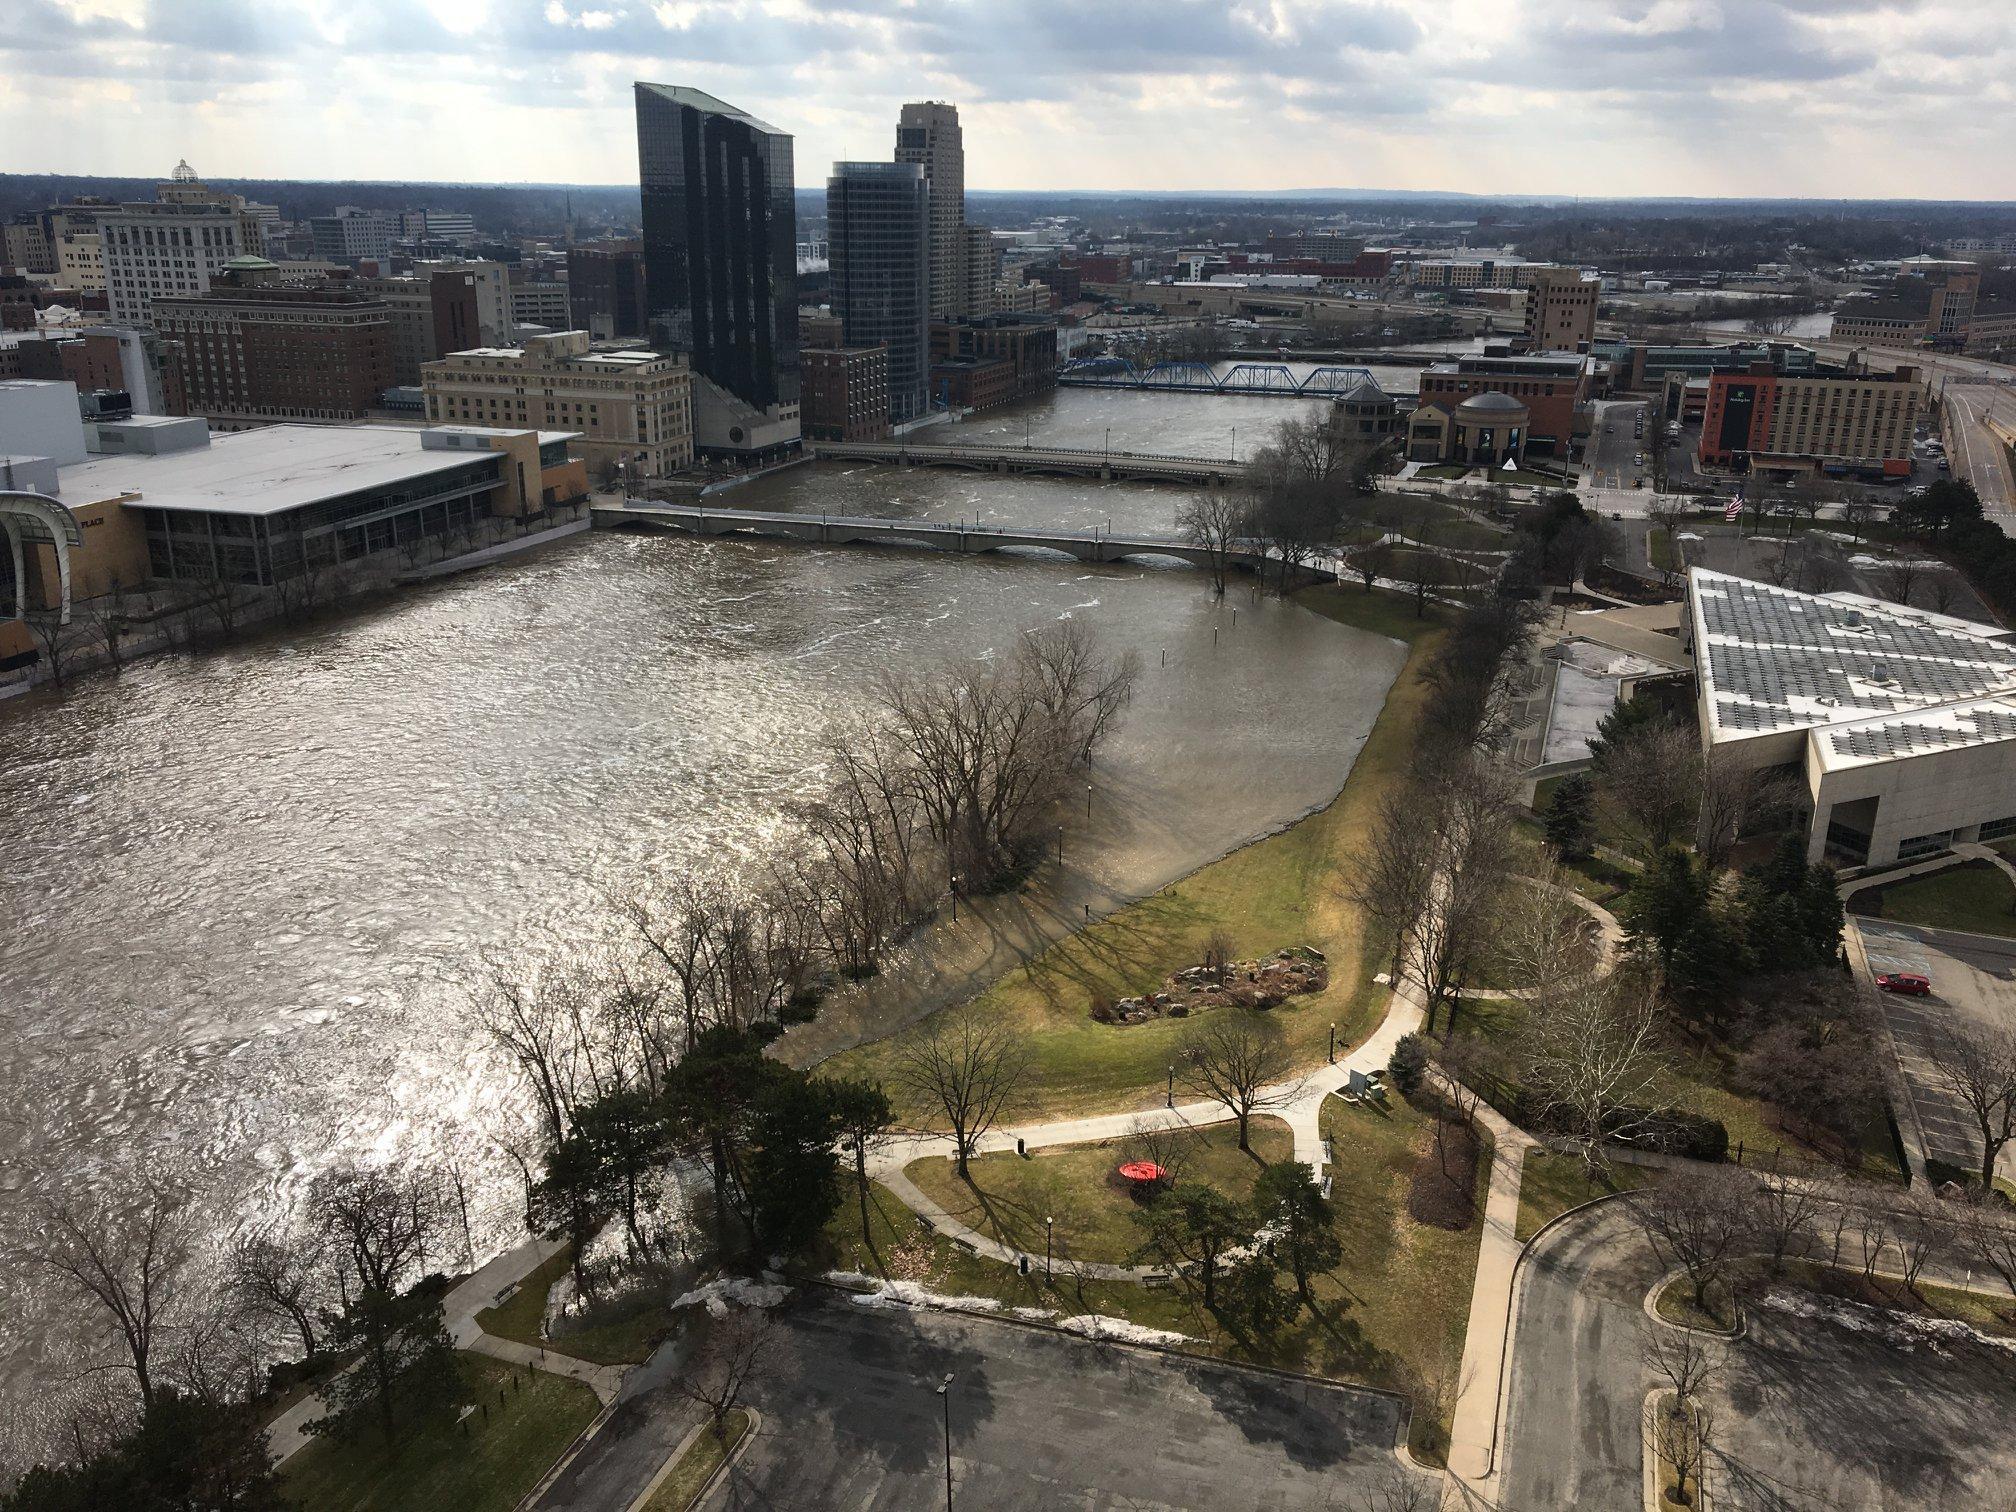 In Grand Rapids Grand River Nears 2013 Levels But City